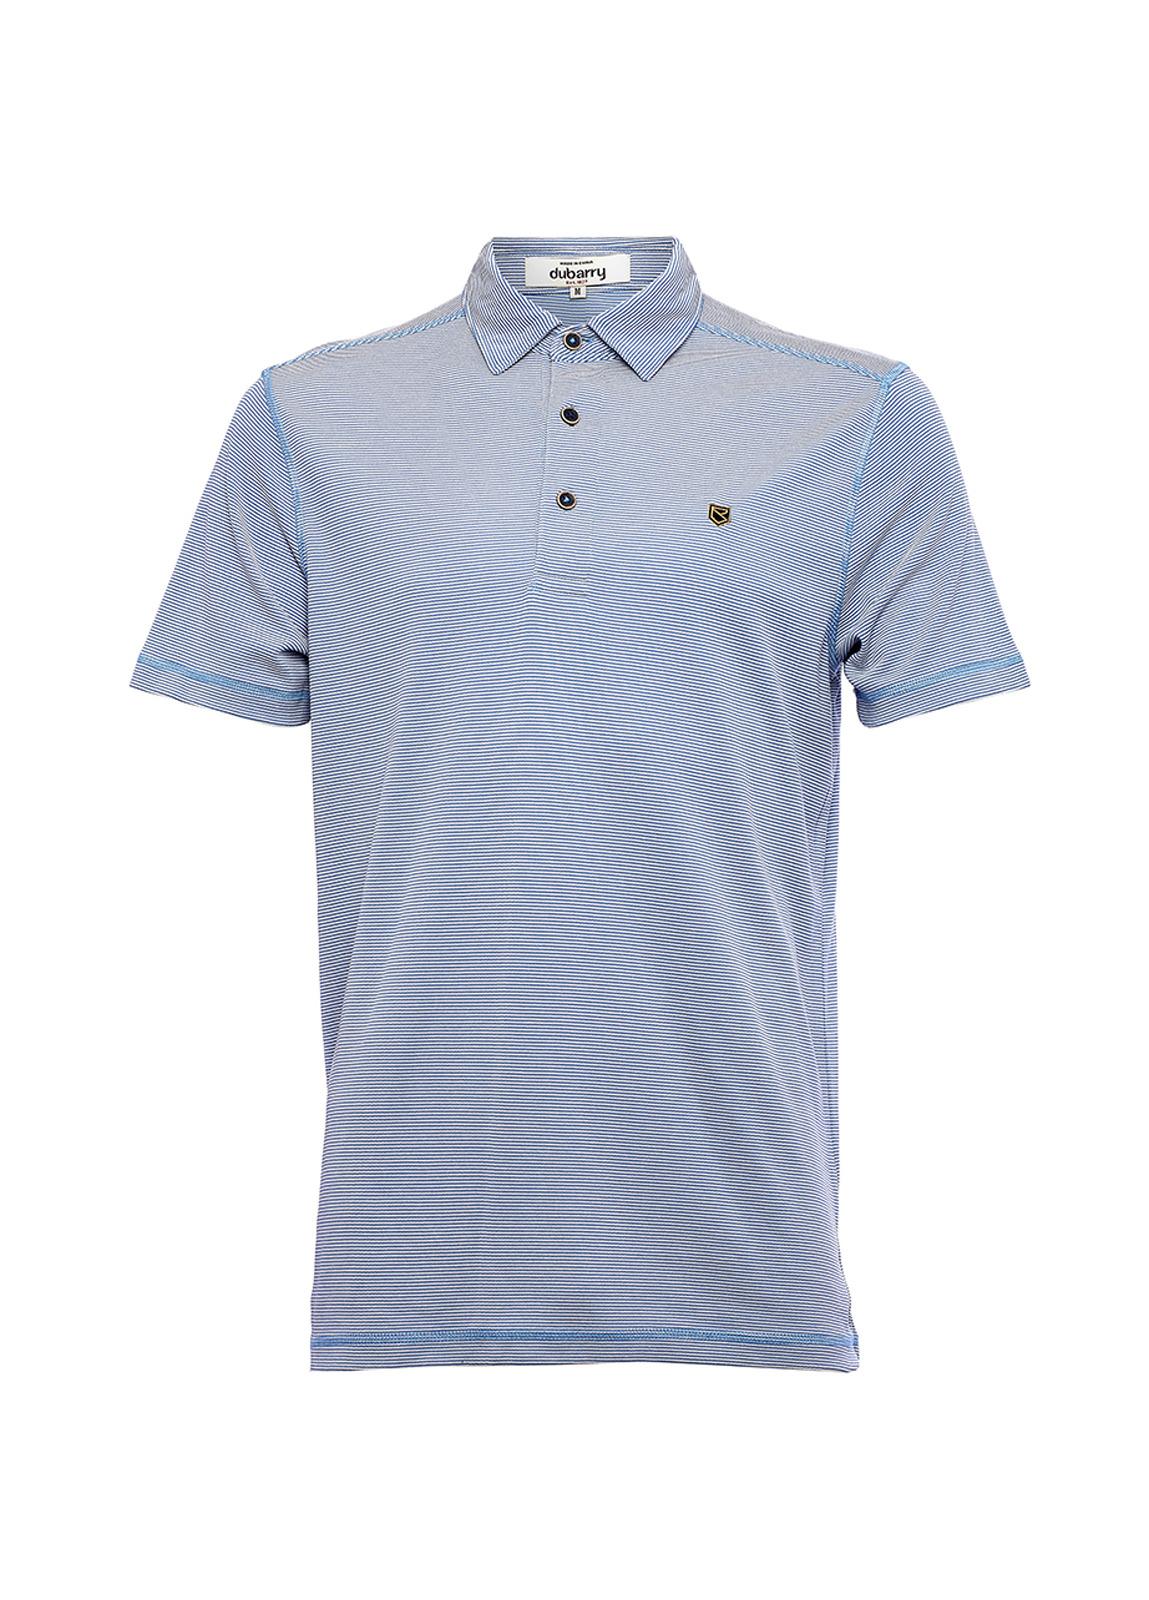 Dubarry_ Drumcliff Polo Shirt - Blue_Image_2